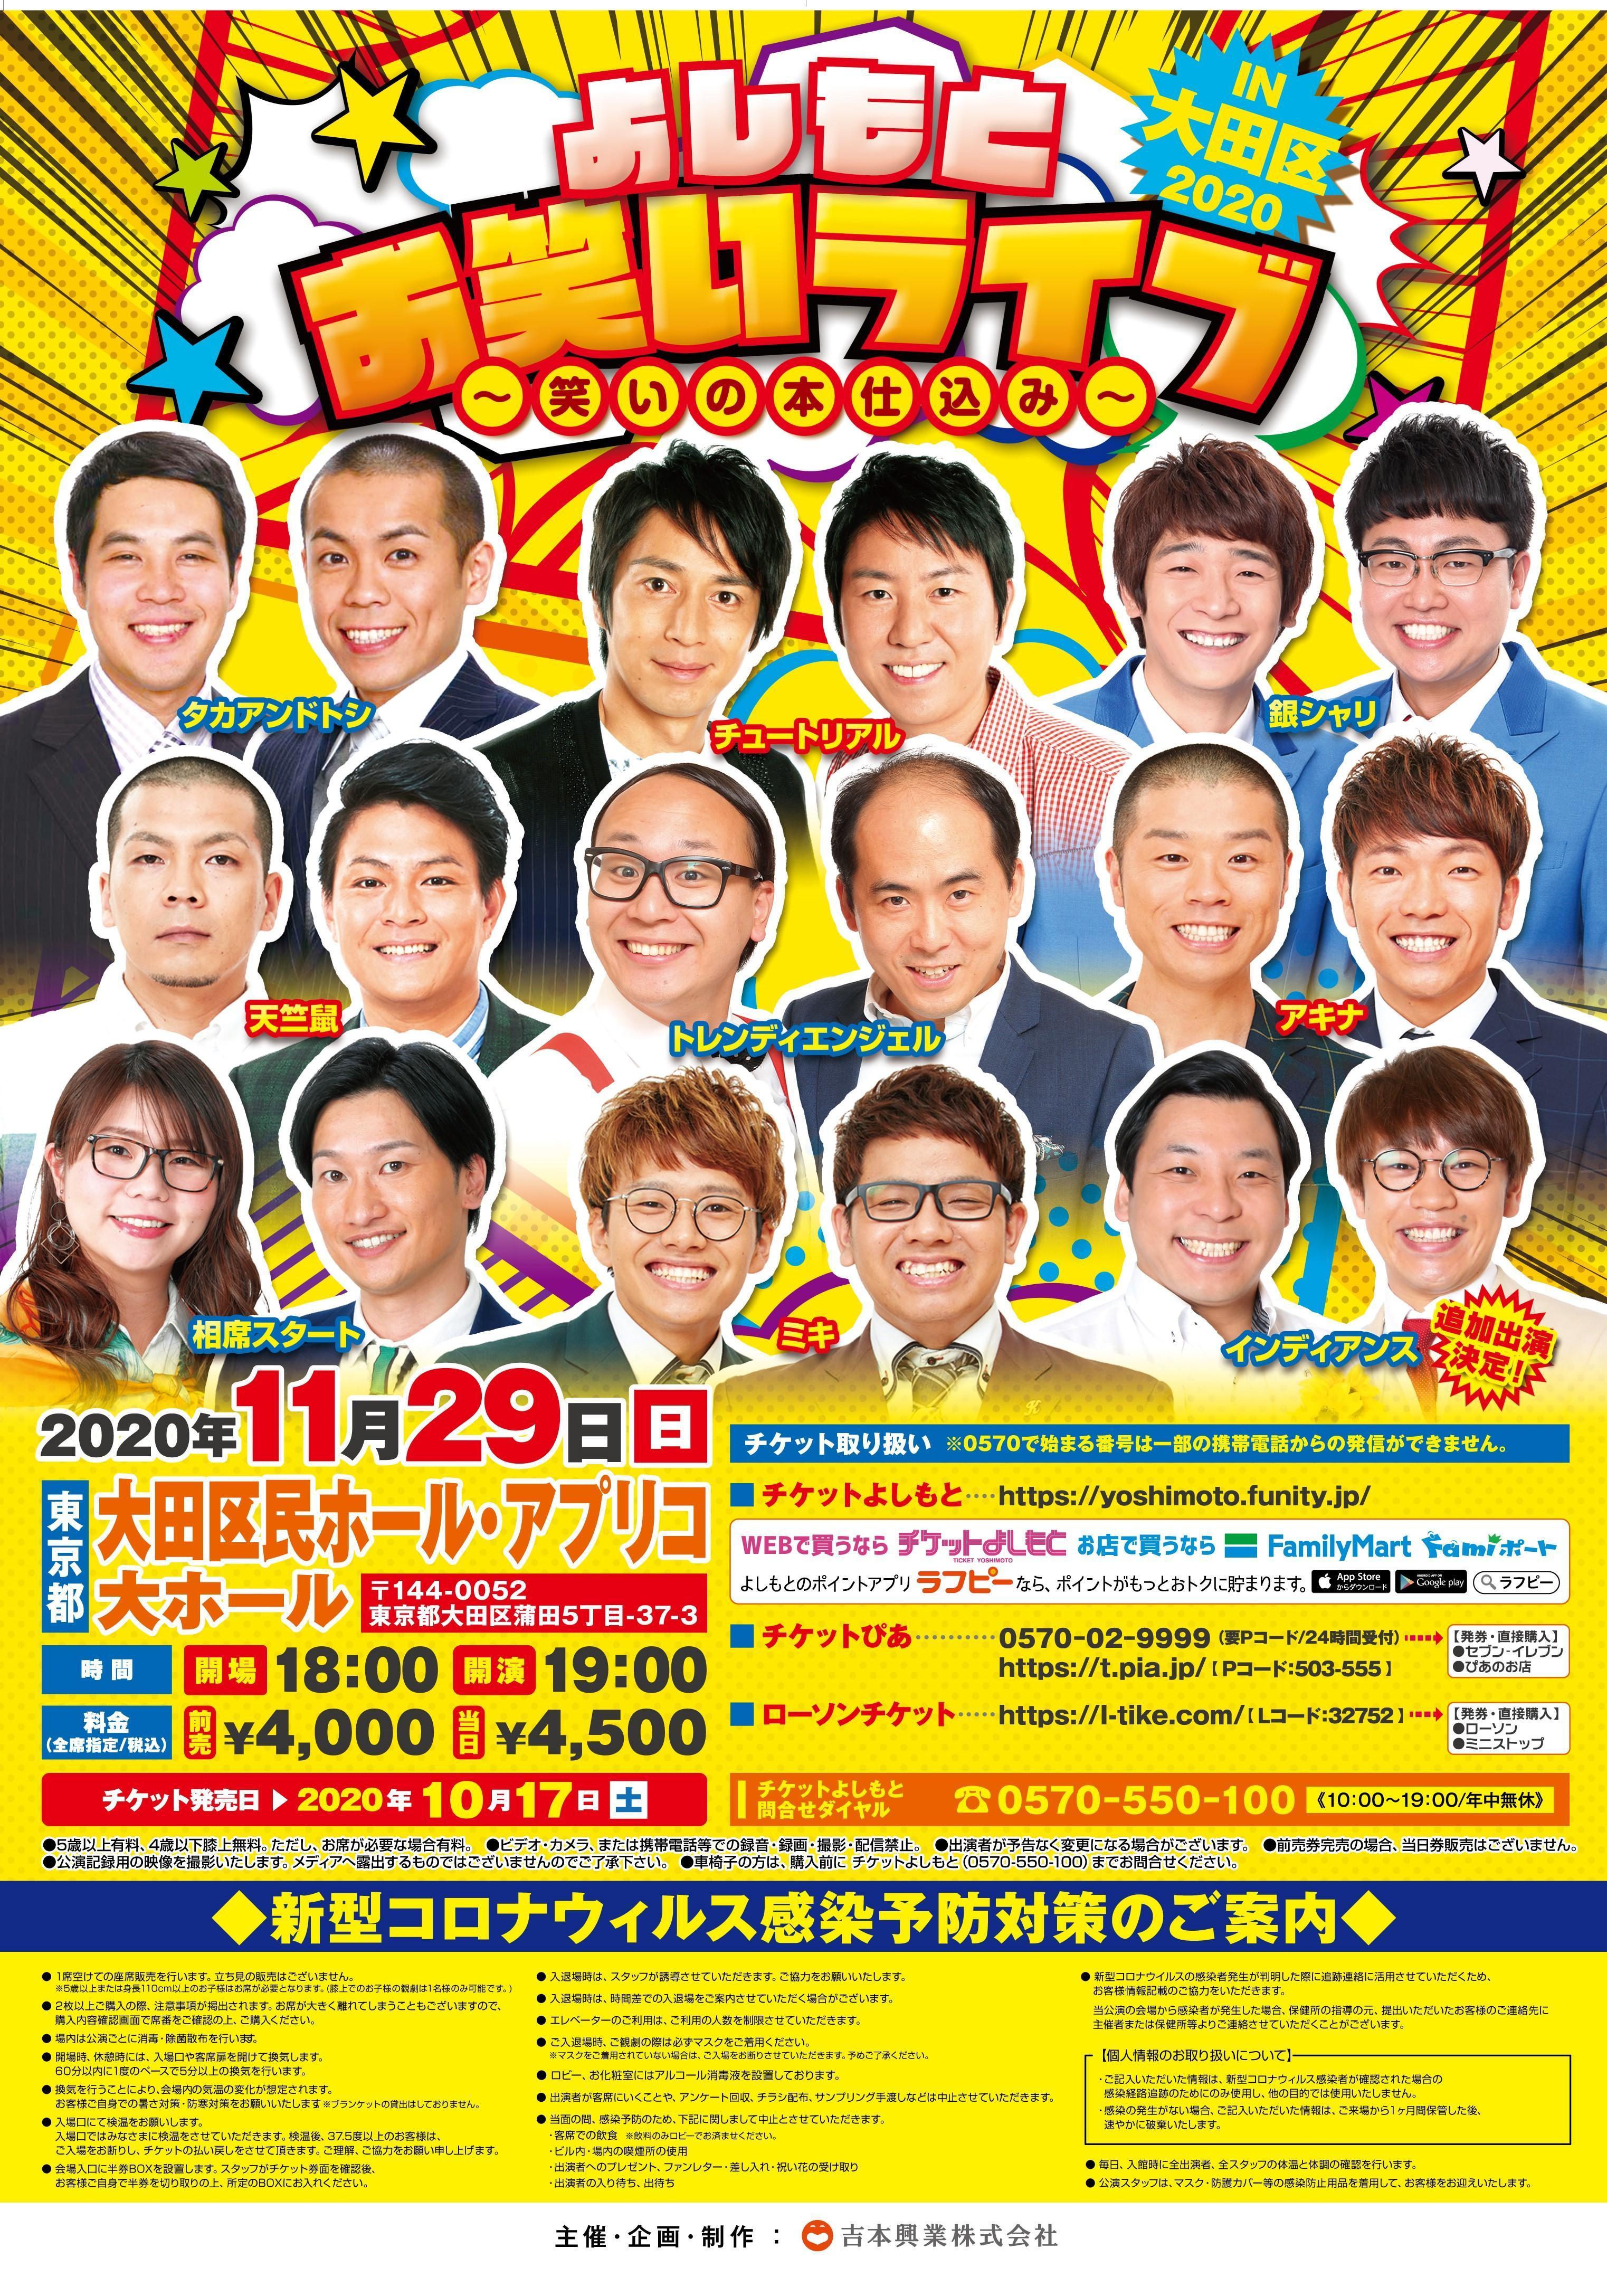 http://www.syumatsu.jp/20201117170325-d90672758dcf229d38f15636b8e5e6da09741bf9.jpg